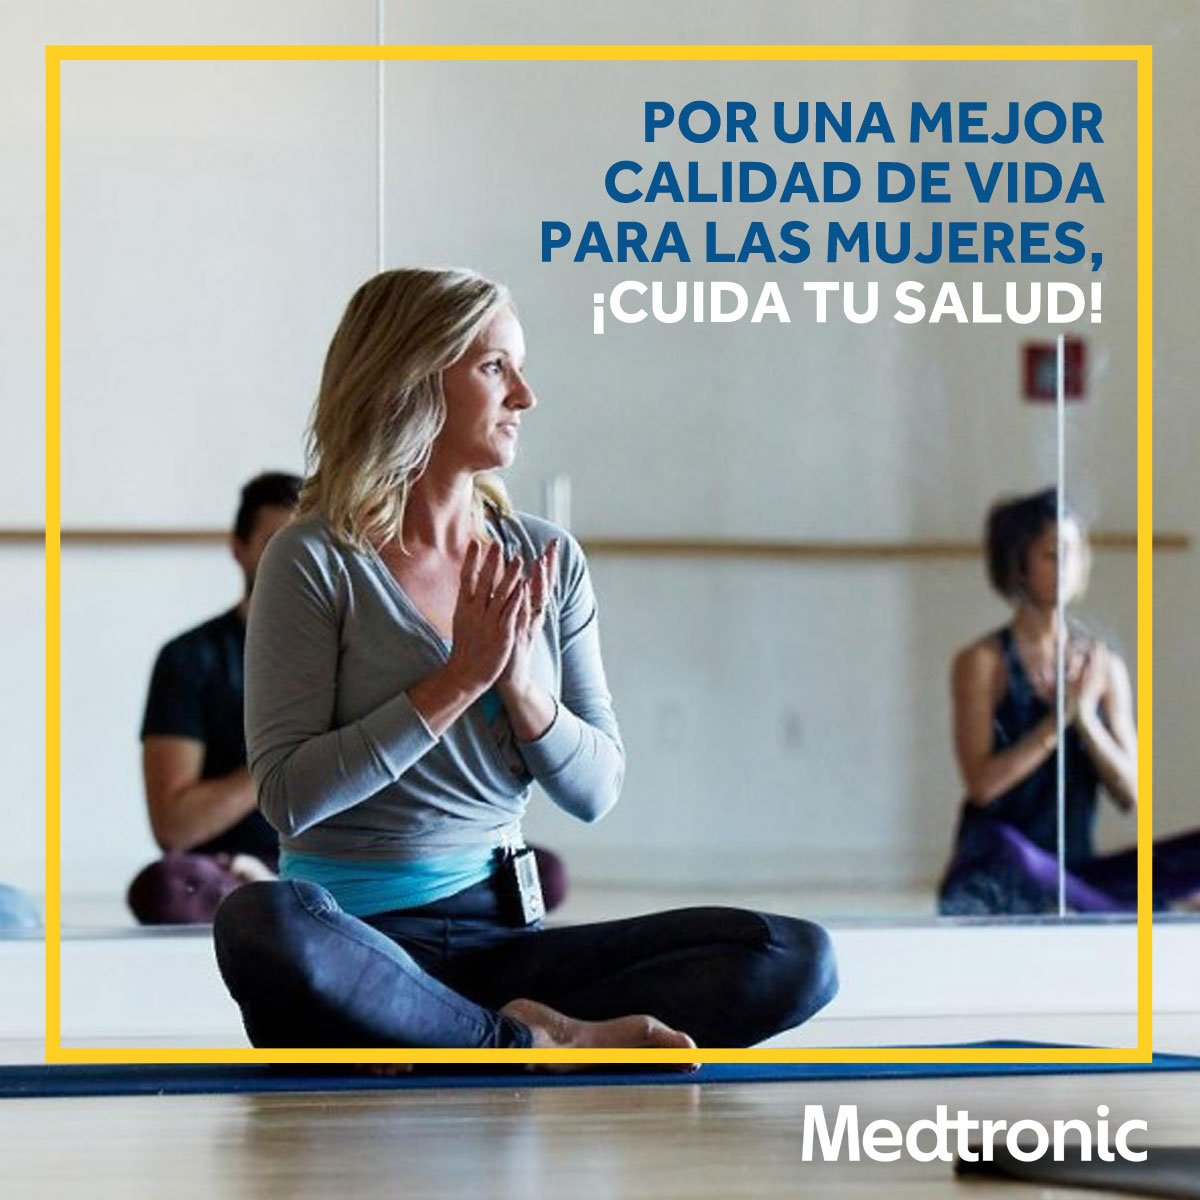 Medtronic Diabetes Latinoamerica - @DiabetesMDTLA Twitter Profile